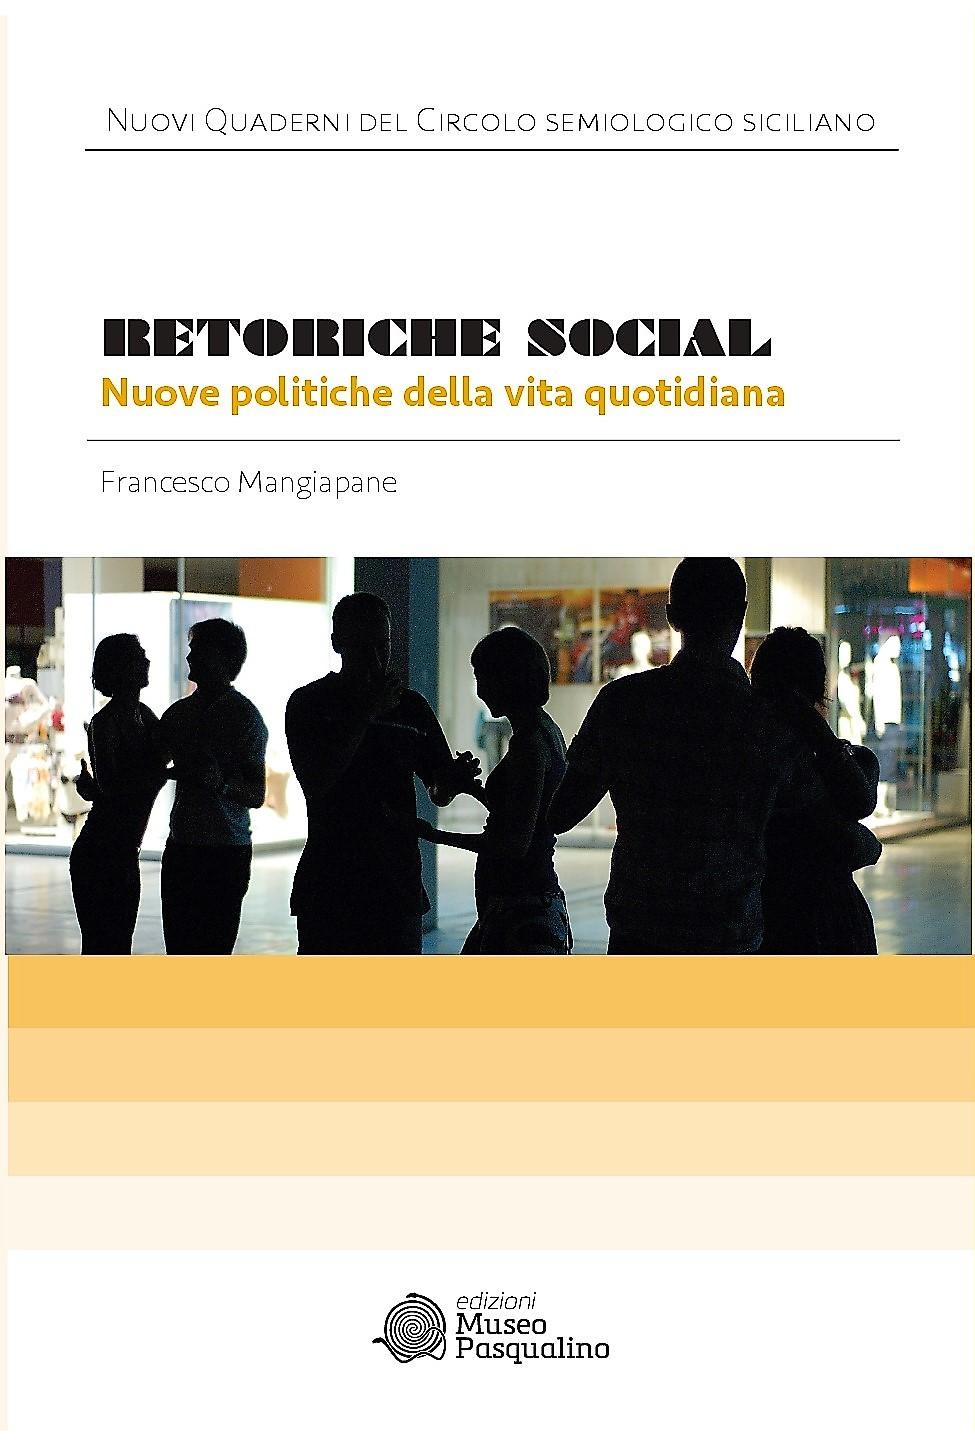 copertina_retoriche_social-001.jpg - 224.96 kB